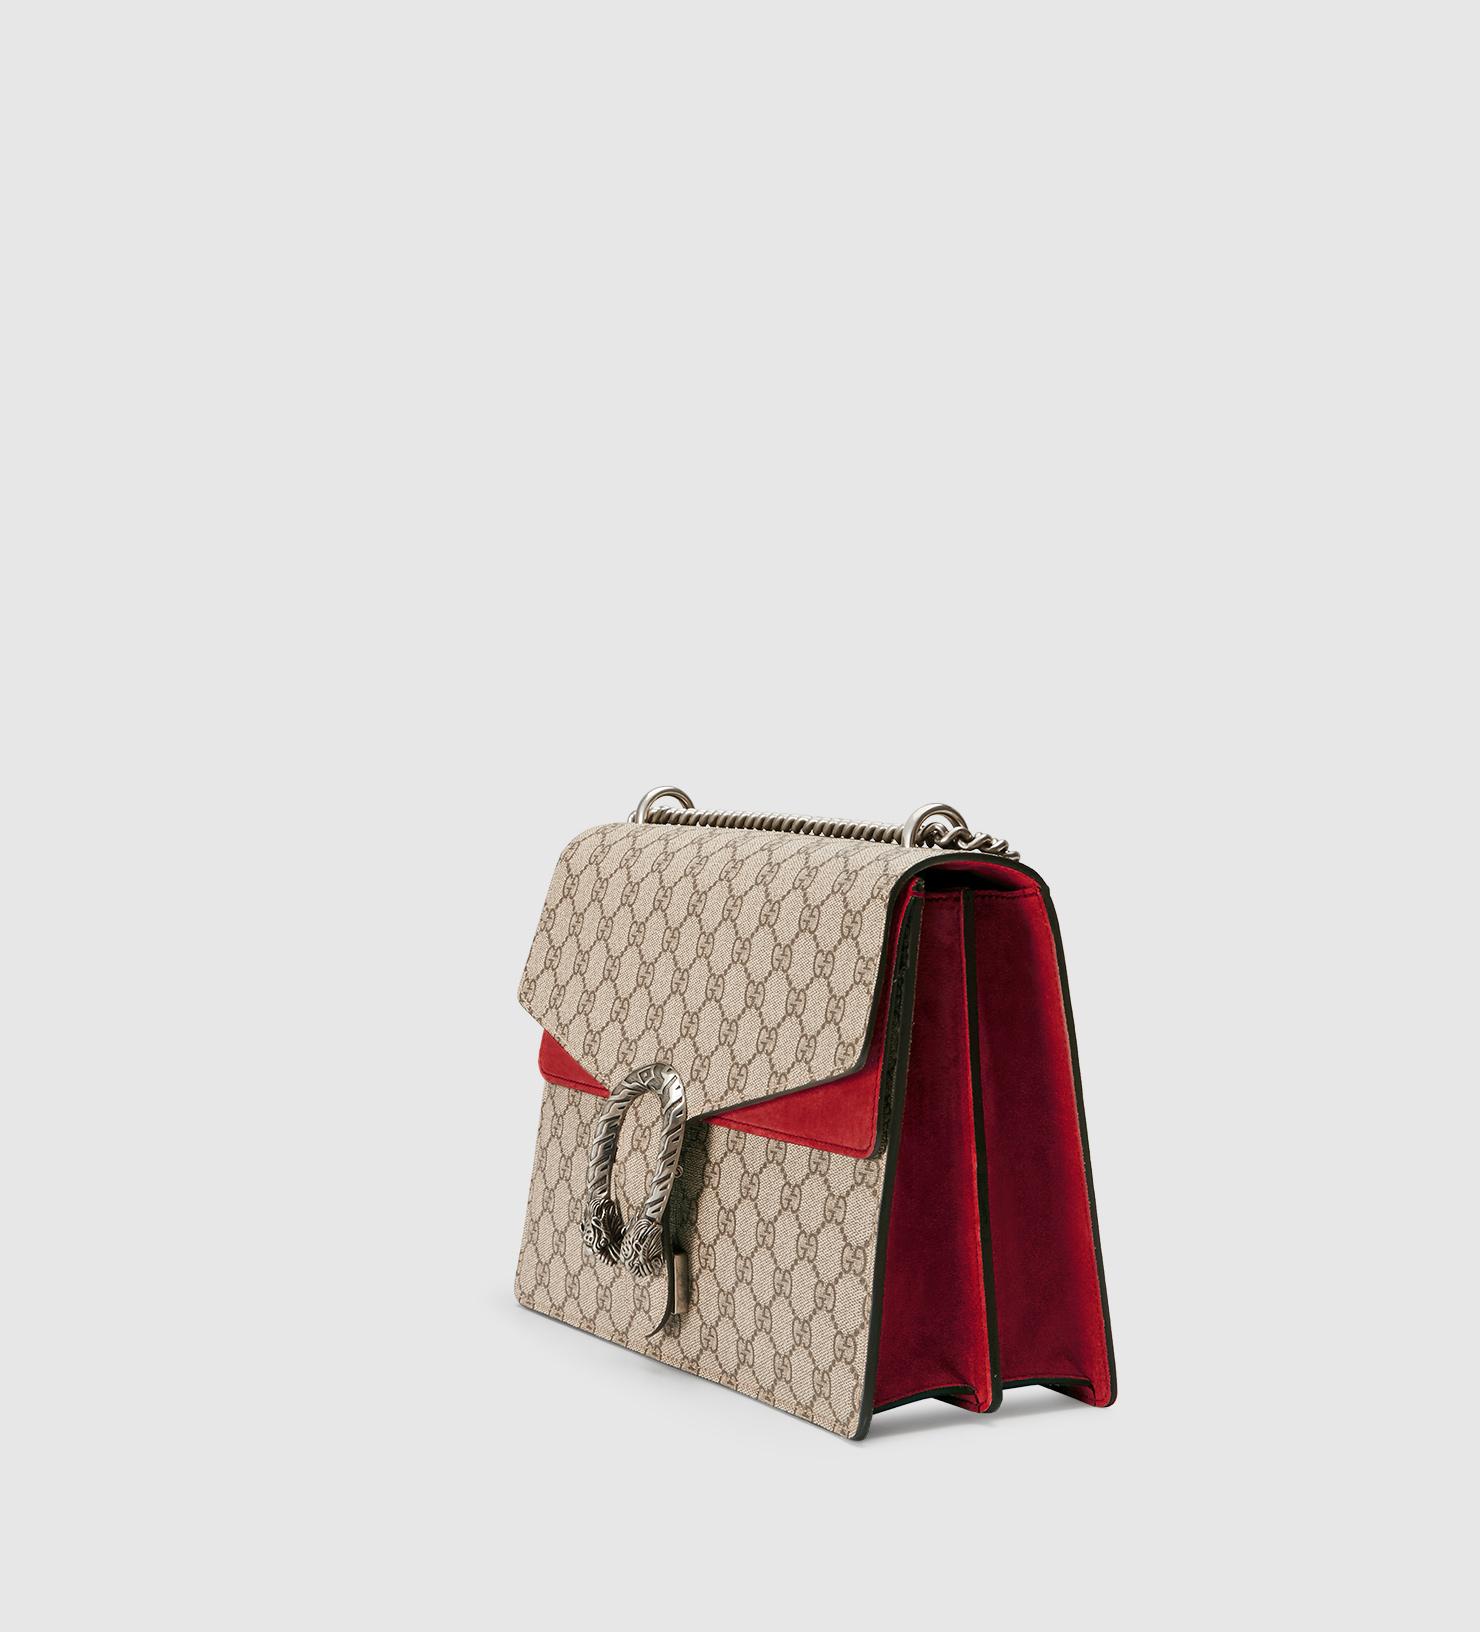 68f2506cbe0 Lyst - Gucci Dionysus GG Supreme Canvas Shoulder Bag in Natural